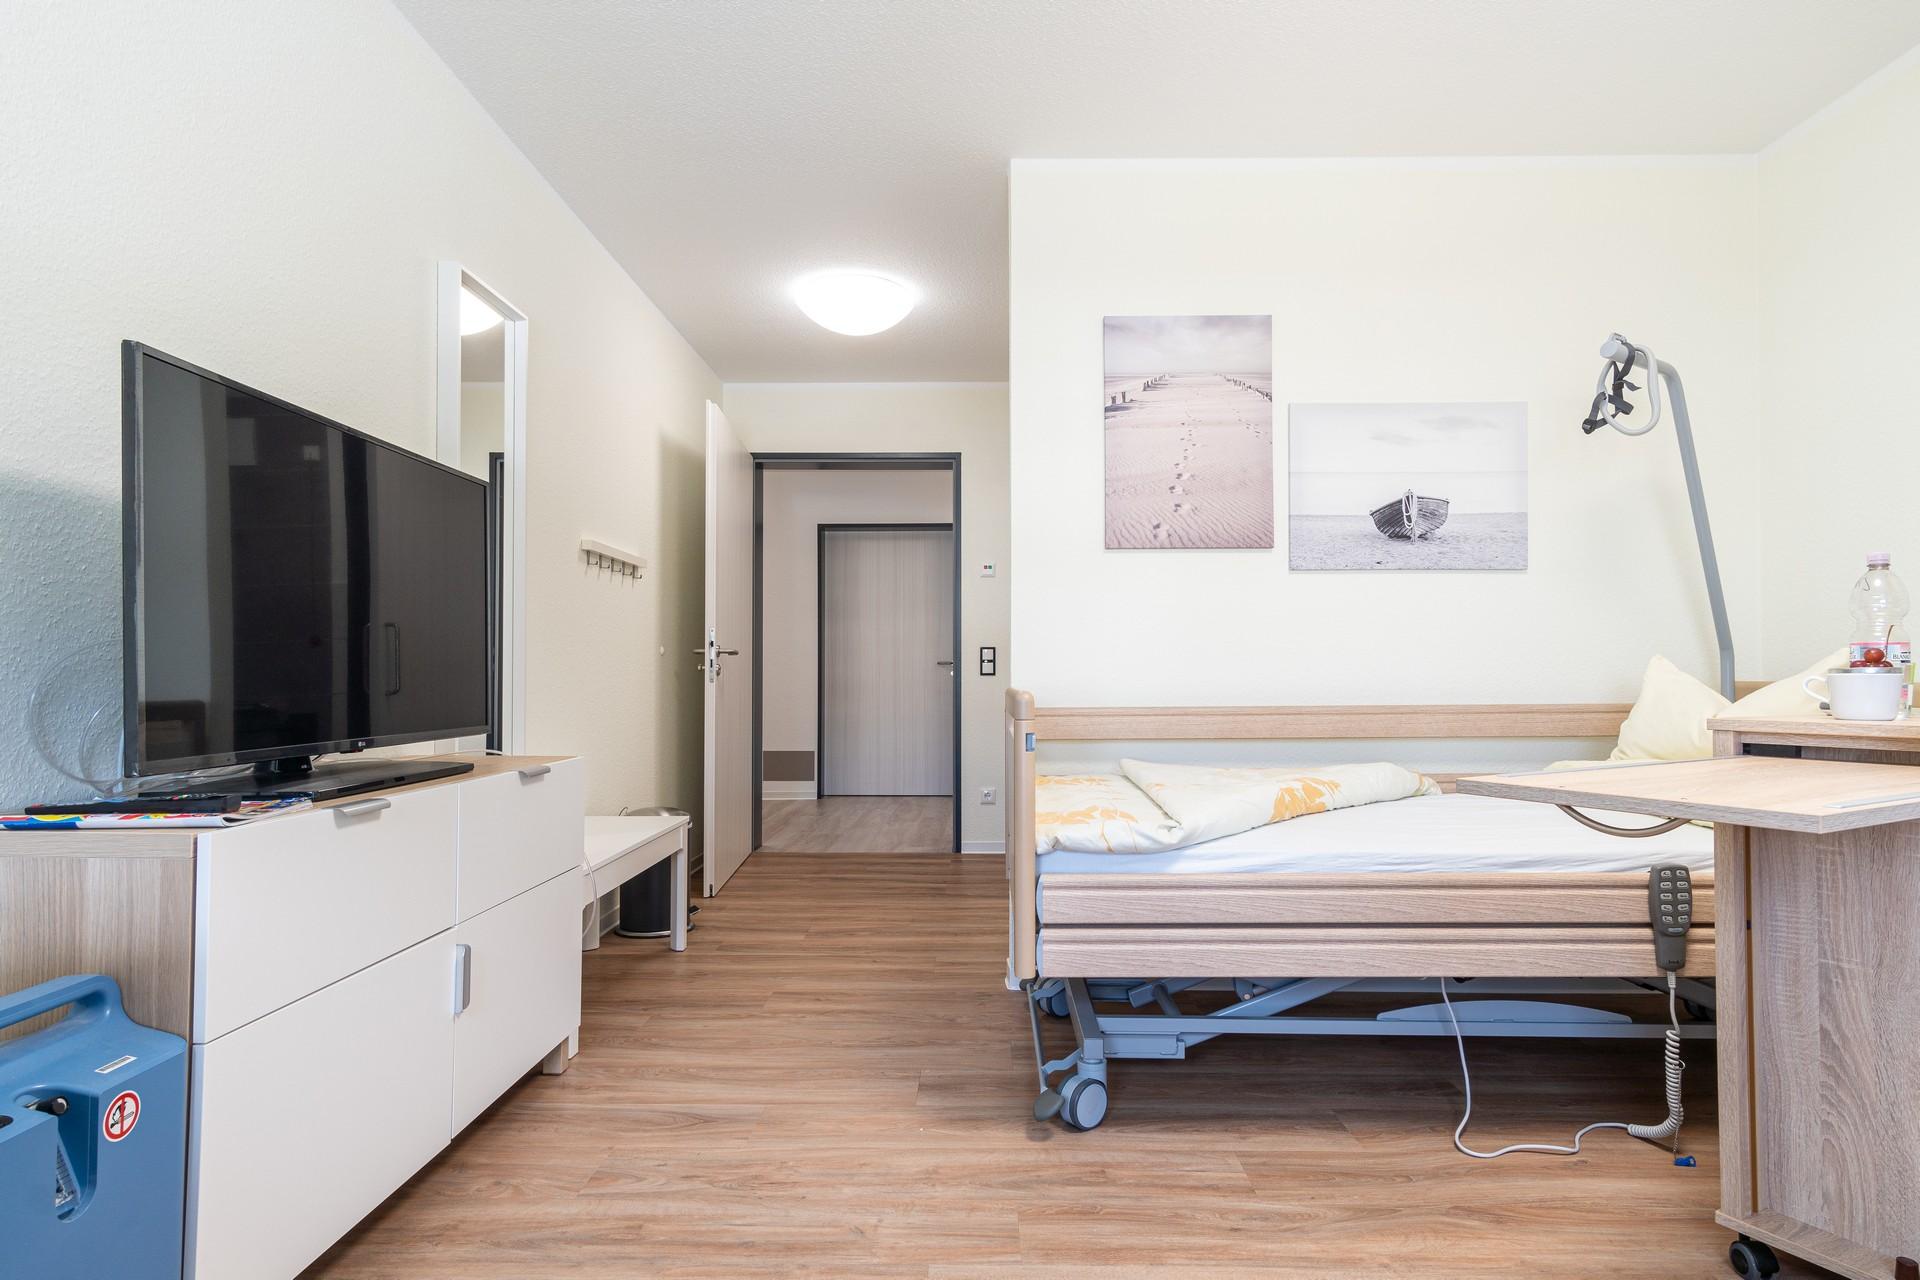 Immobilienfotograf Magdeburg